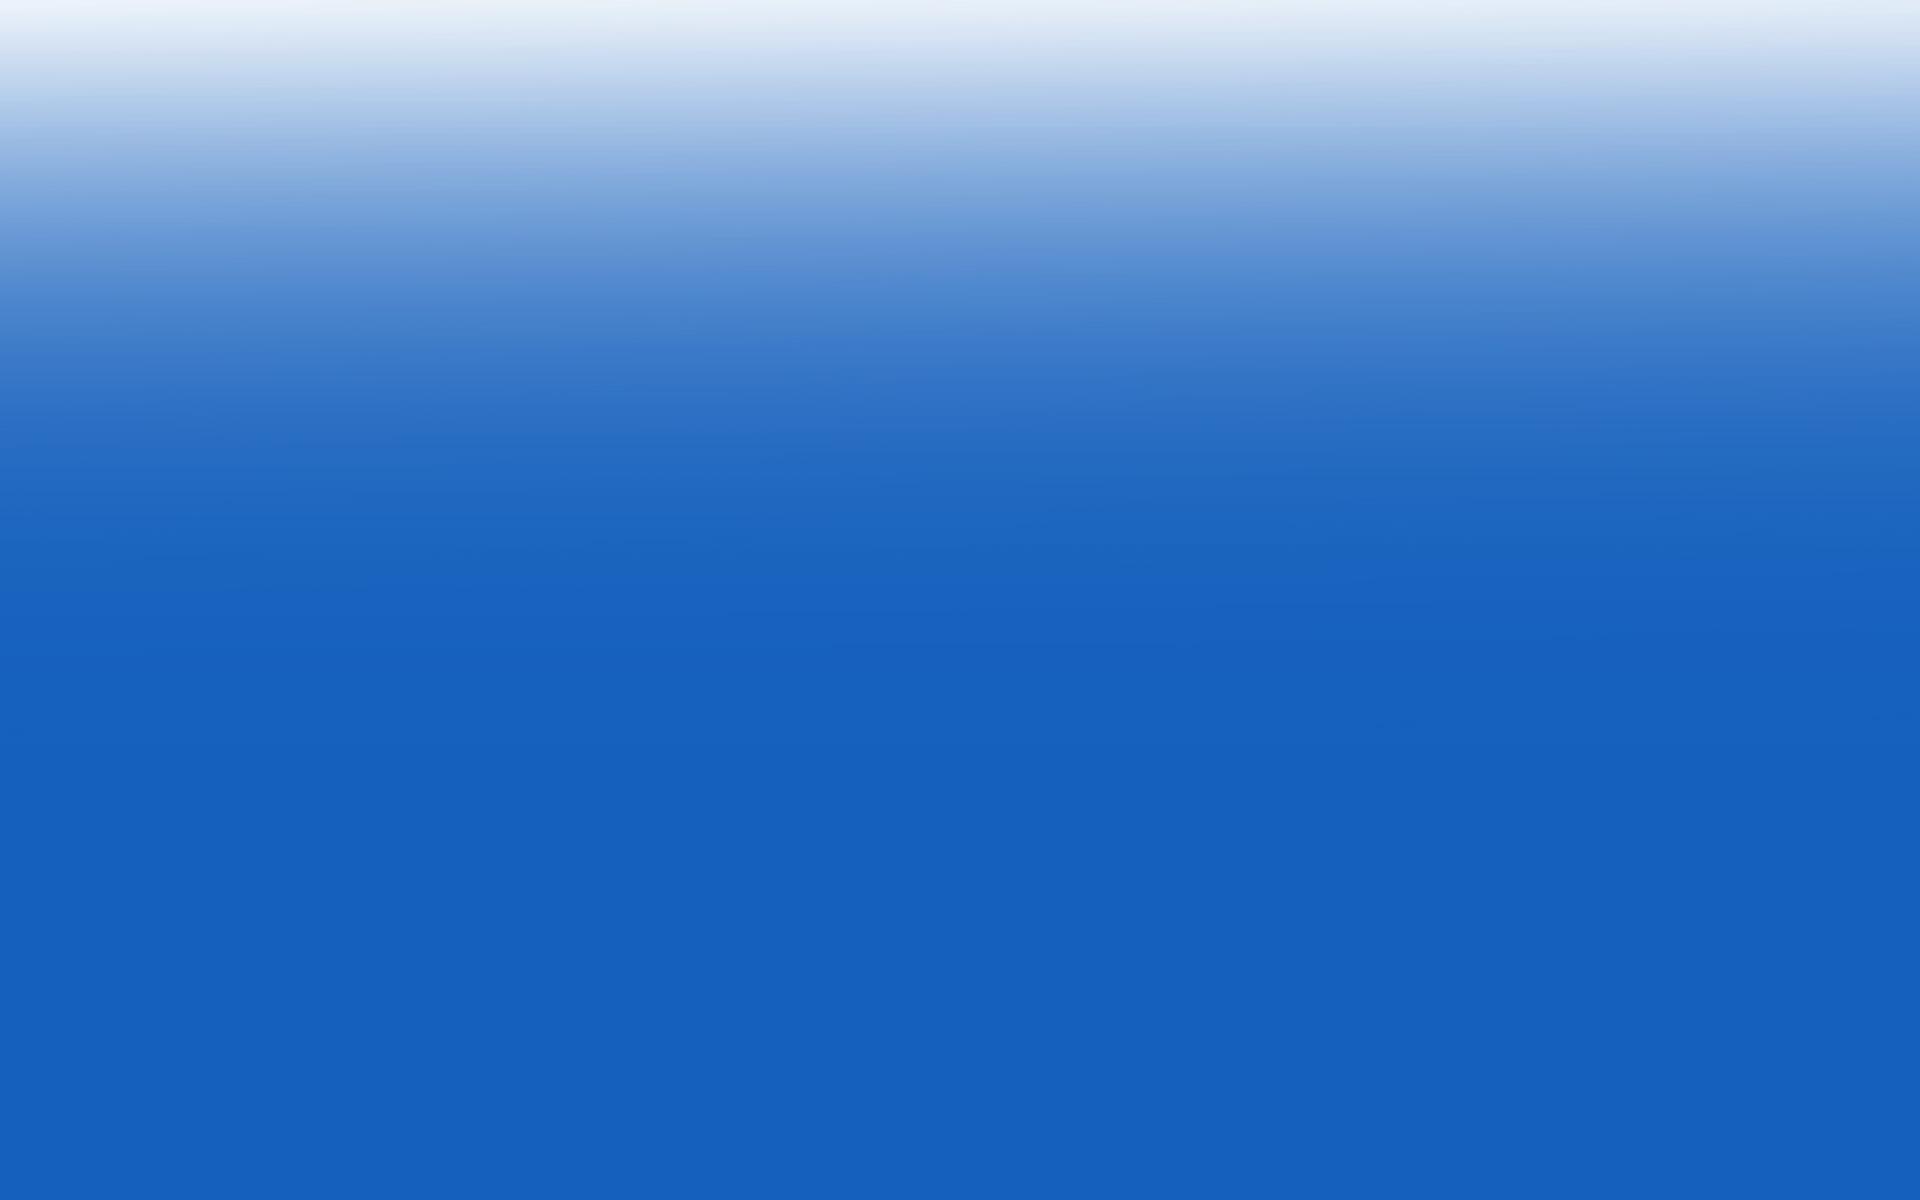   Denim Blue to White Wallpaper. Gradient